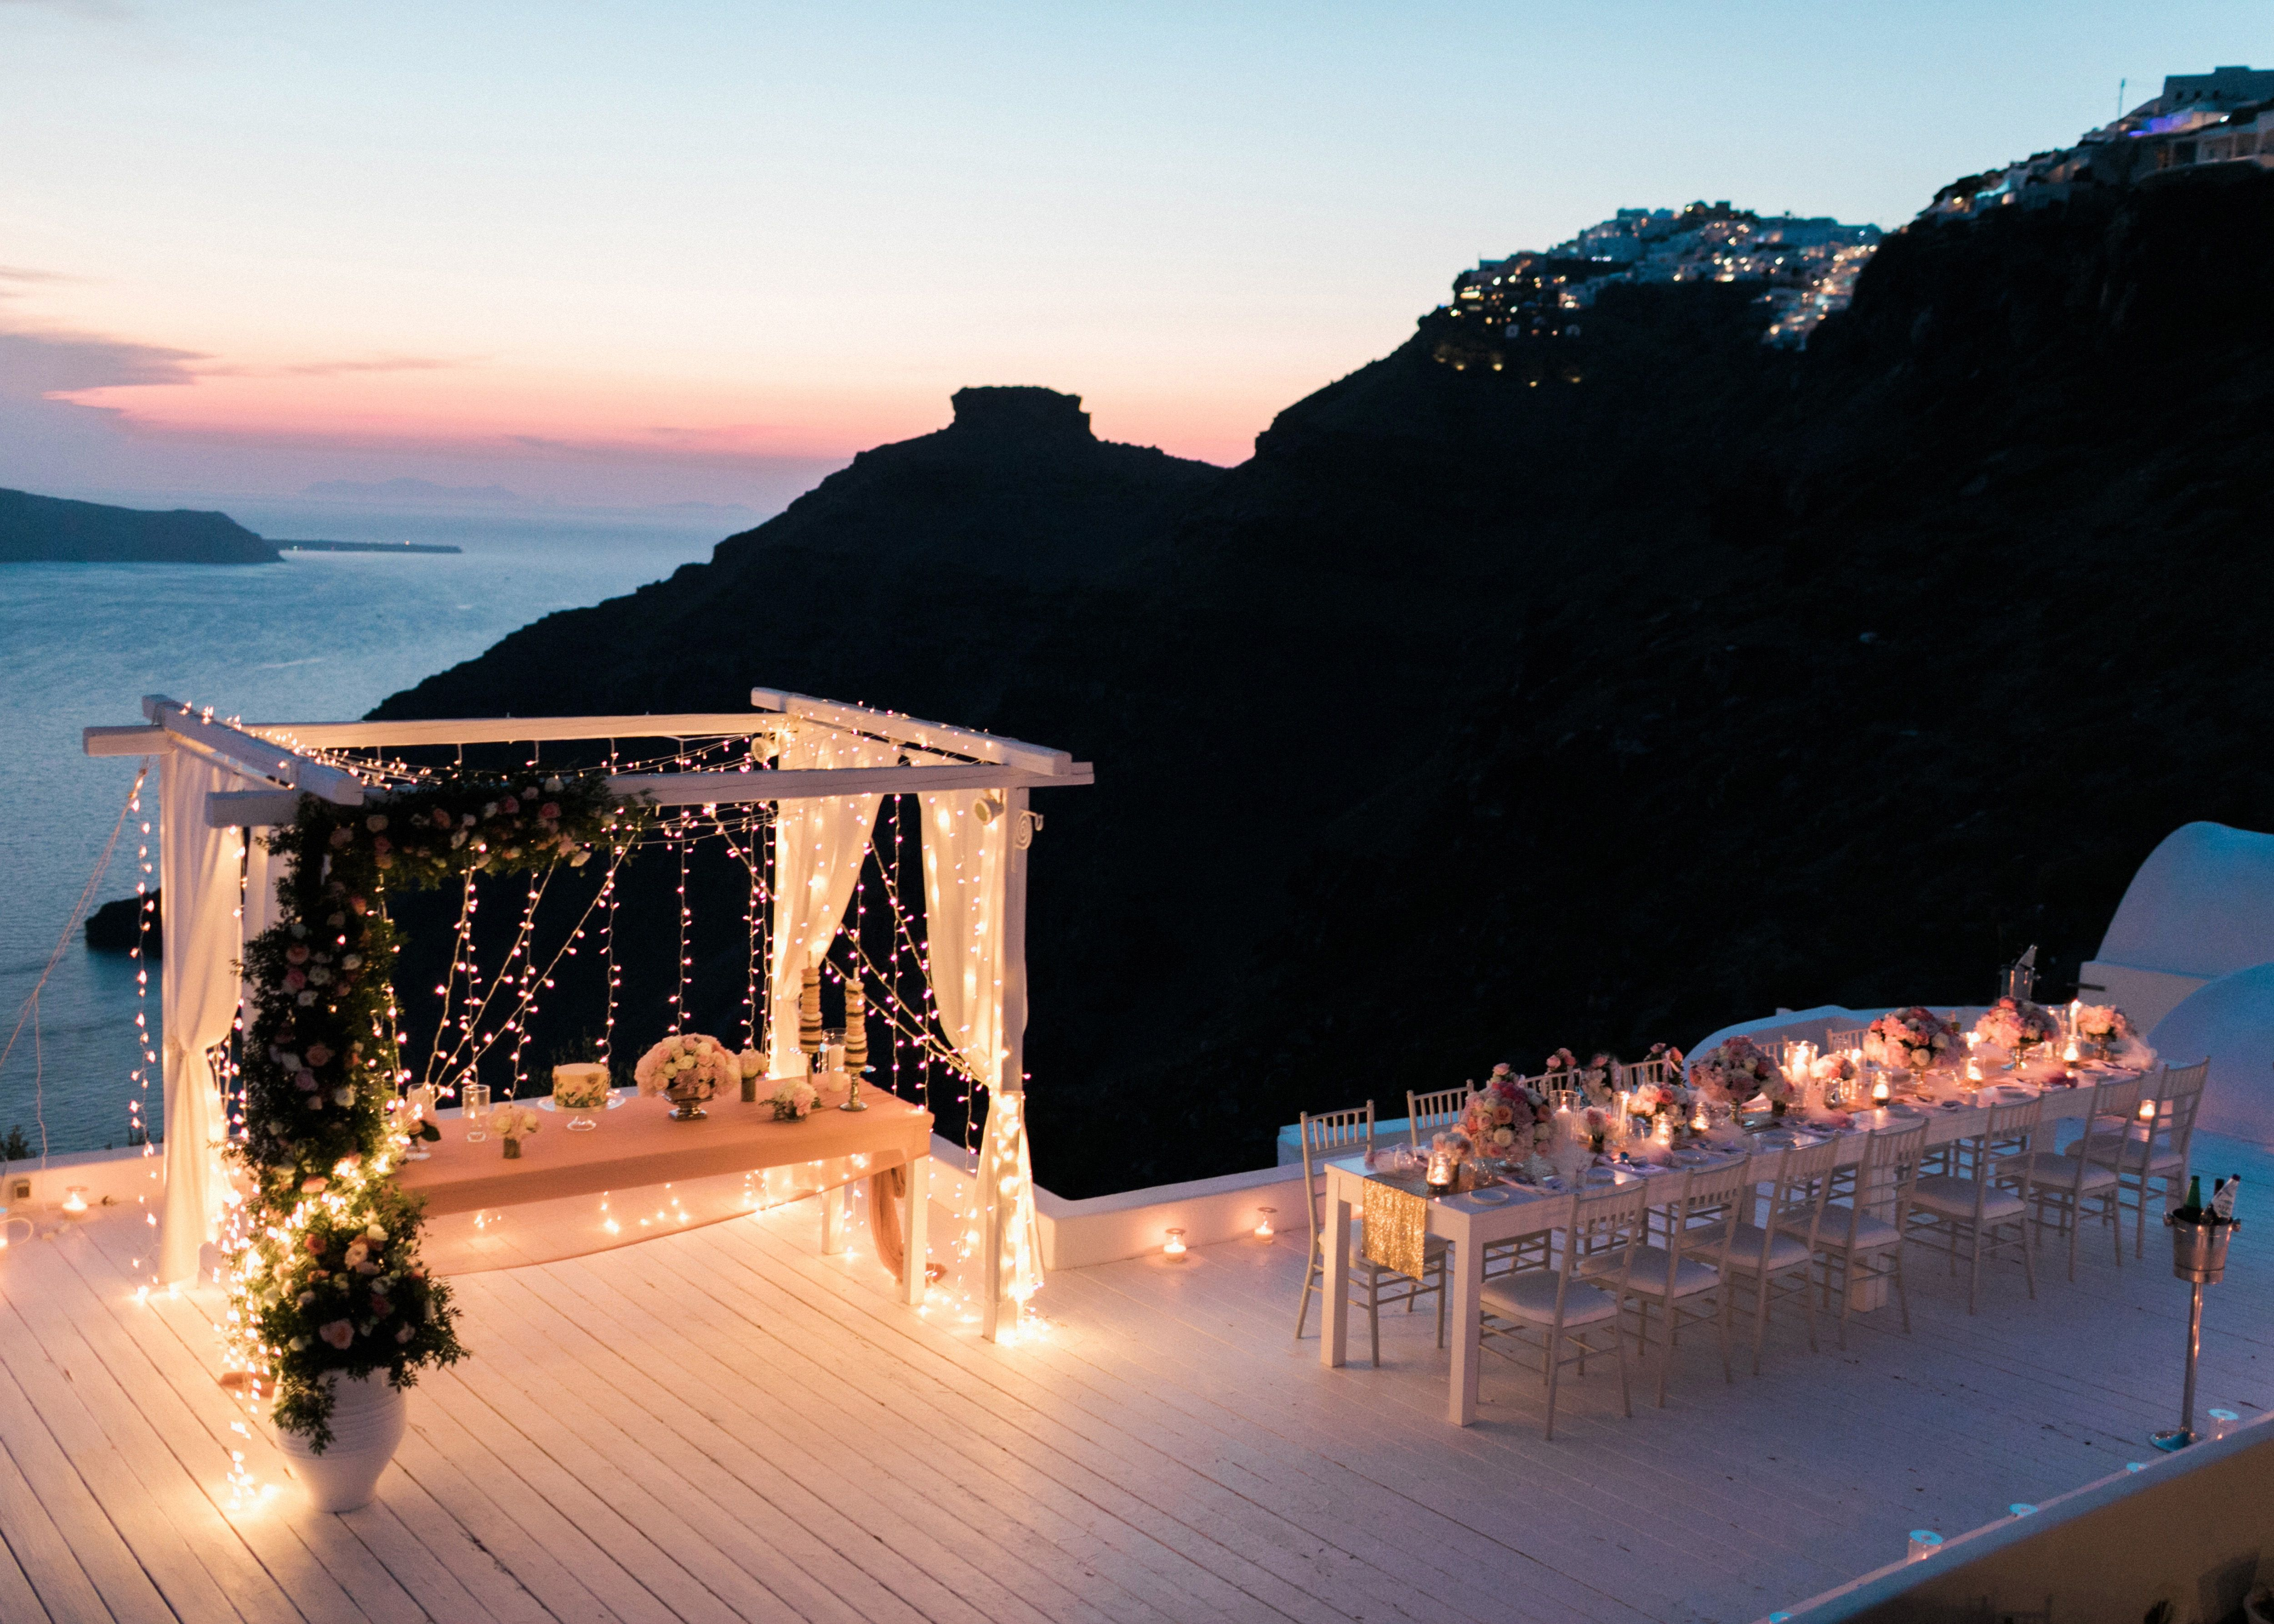 40 Romantic Beach Wedding Decorations With Images Night Beach